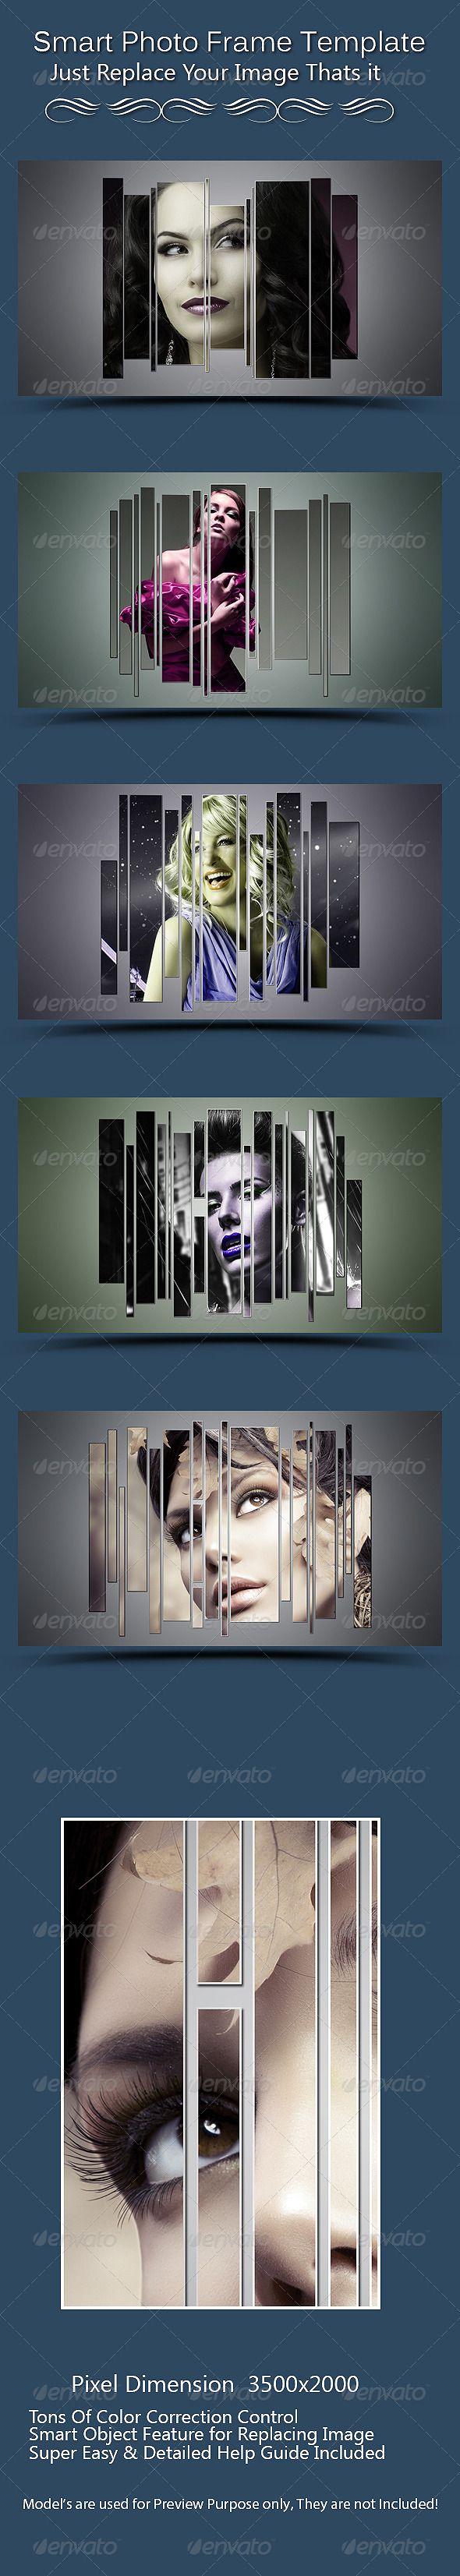 Smart  Photo Frame Template PSD #design Download: http://graphicriver.net/item/smart-photo-frame-template/7897501?ref=ksioks